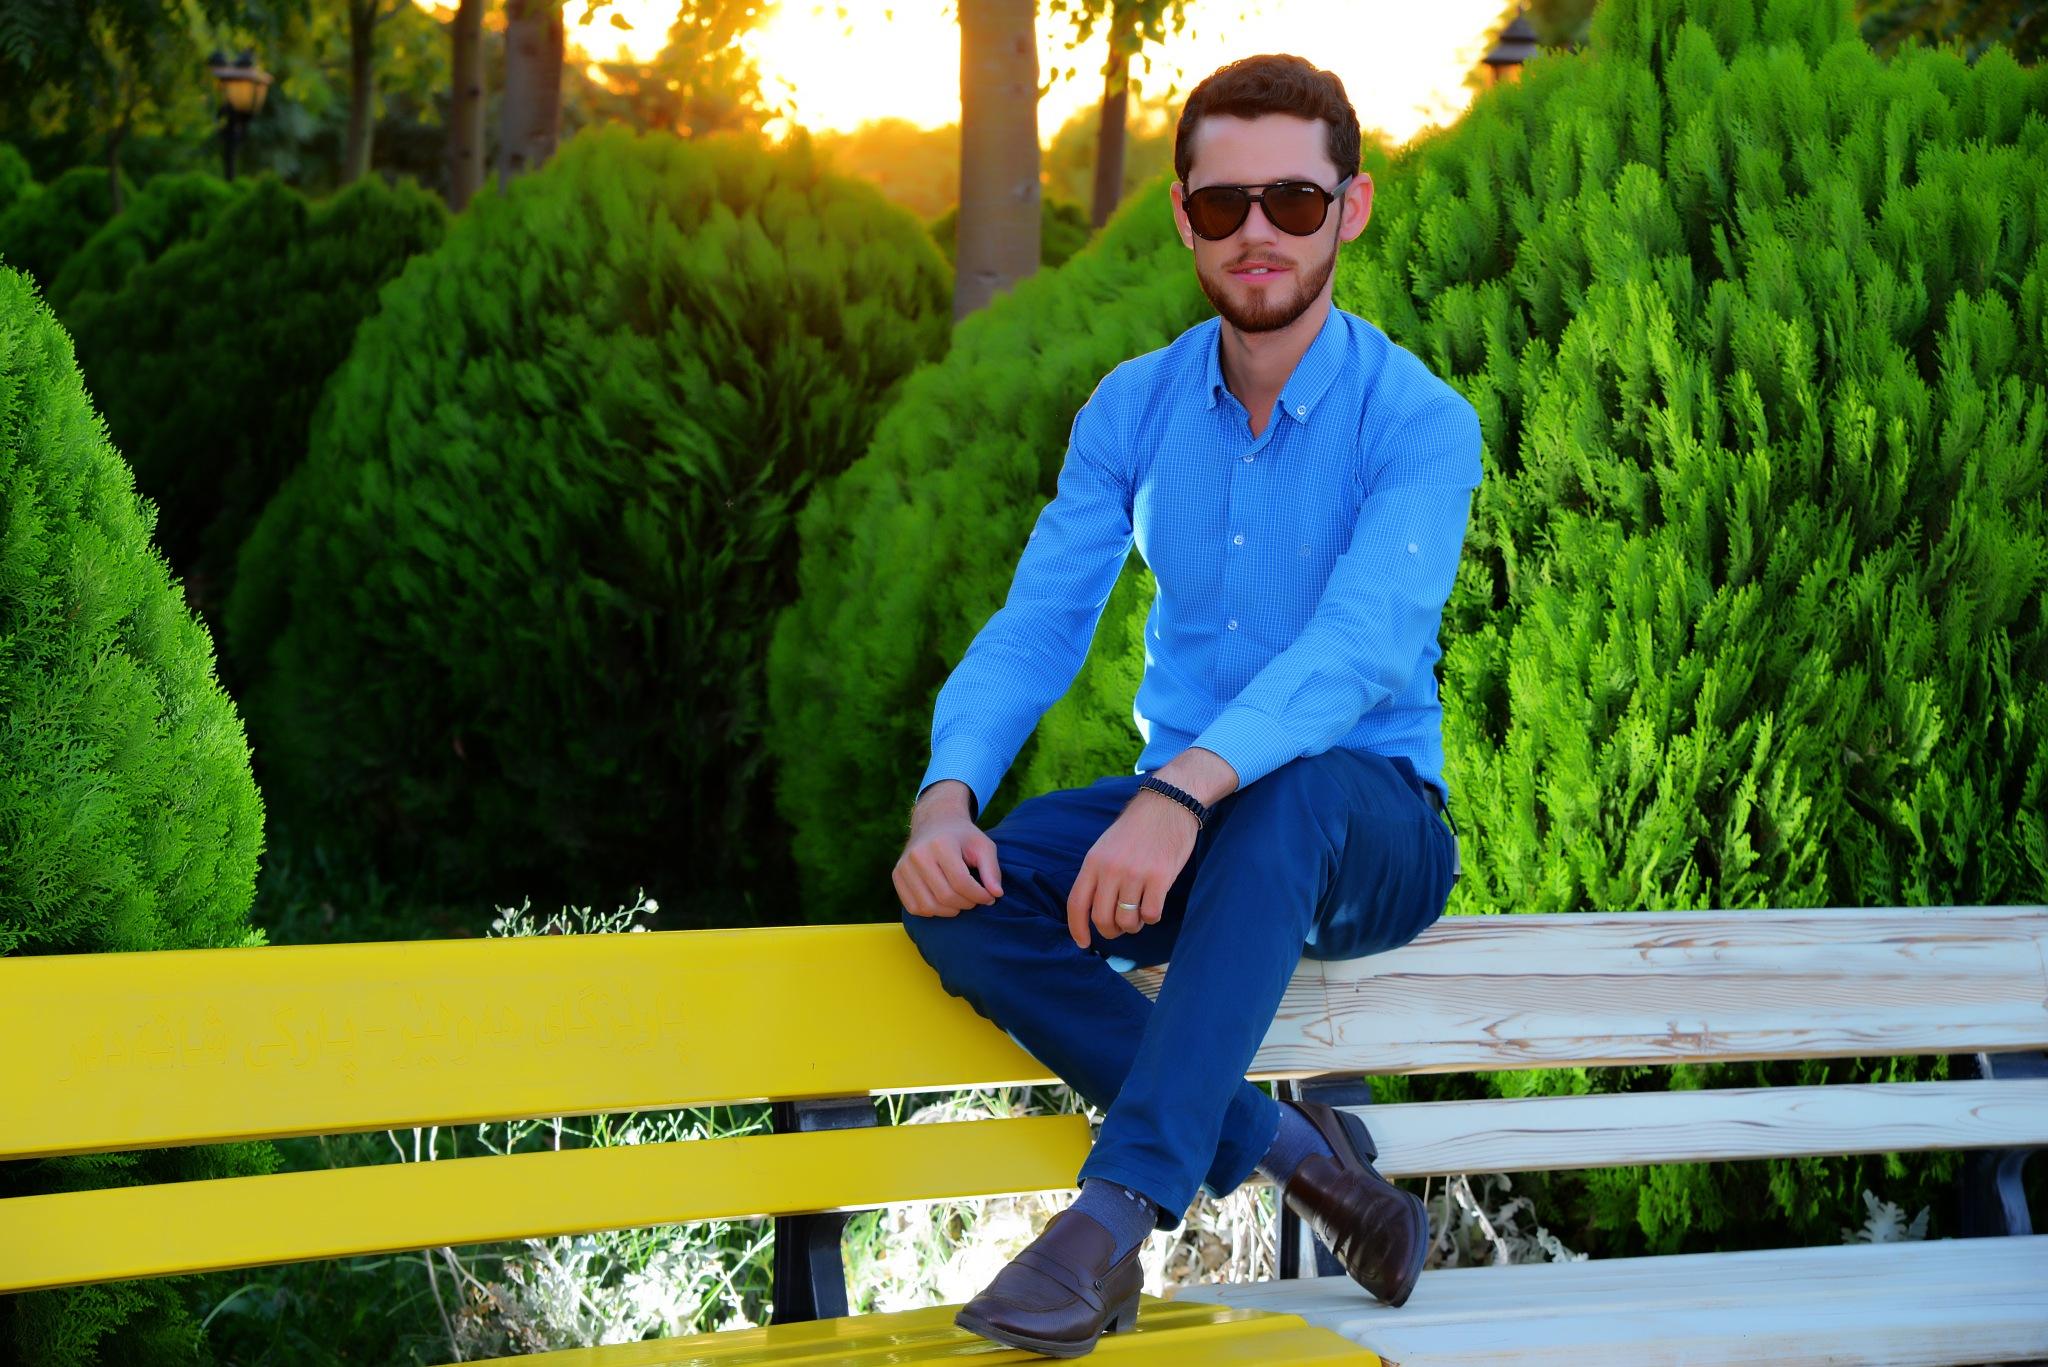 happy birthday my friend  by Farman Kurdish